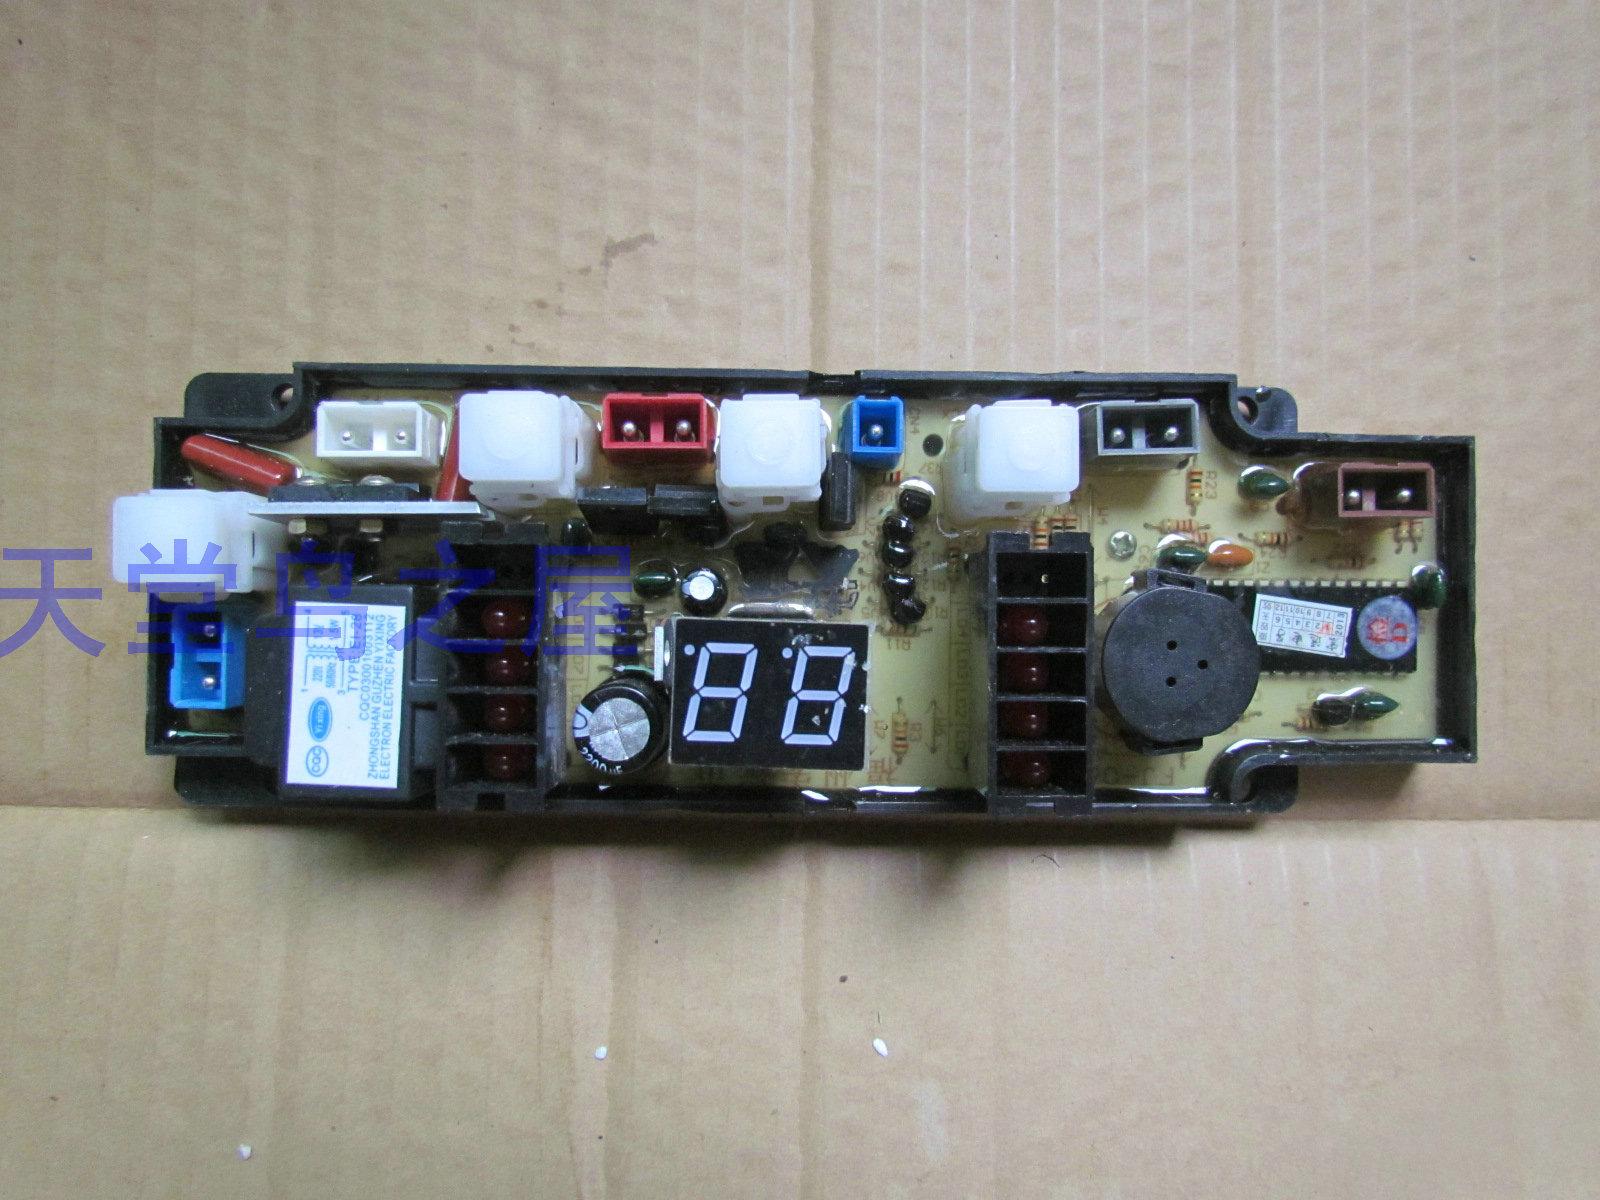 Washing machine accessories pc board motherboard program control hf-2288-x xqb55-2288 washing machine board xqb55 8960g xqb48 861 original motherboard hf 852 x